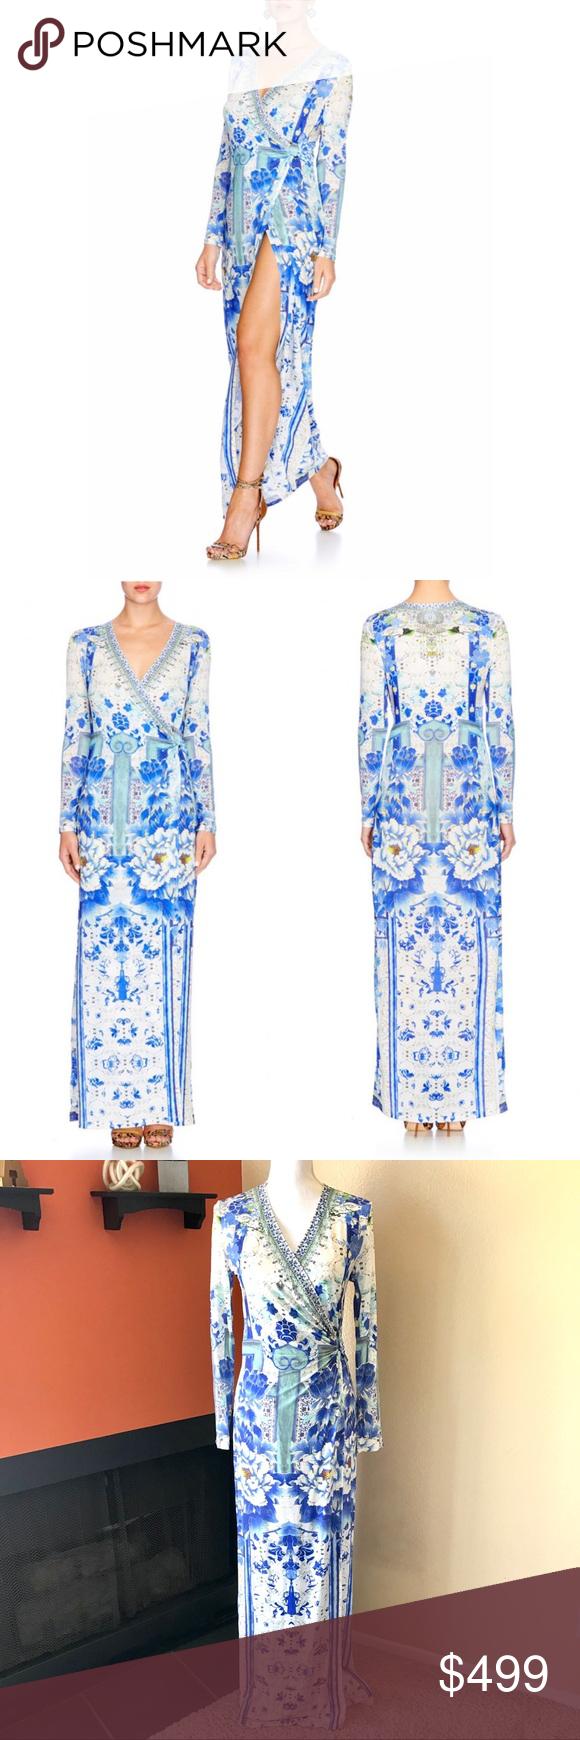 NEW Camilla Porcelain Paradise Wrap Dress M Camilla Porcelain paradise wrap  dress Size XS new with 9d84409bfa2